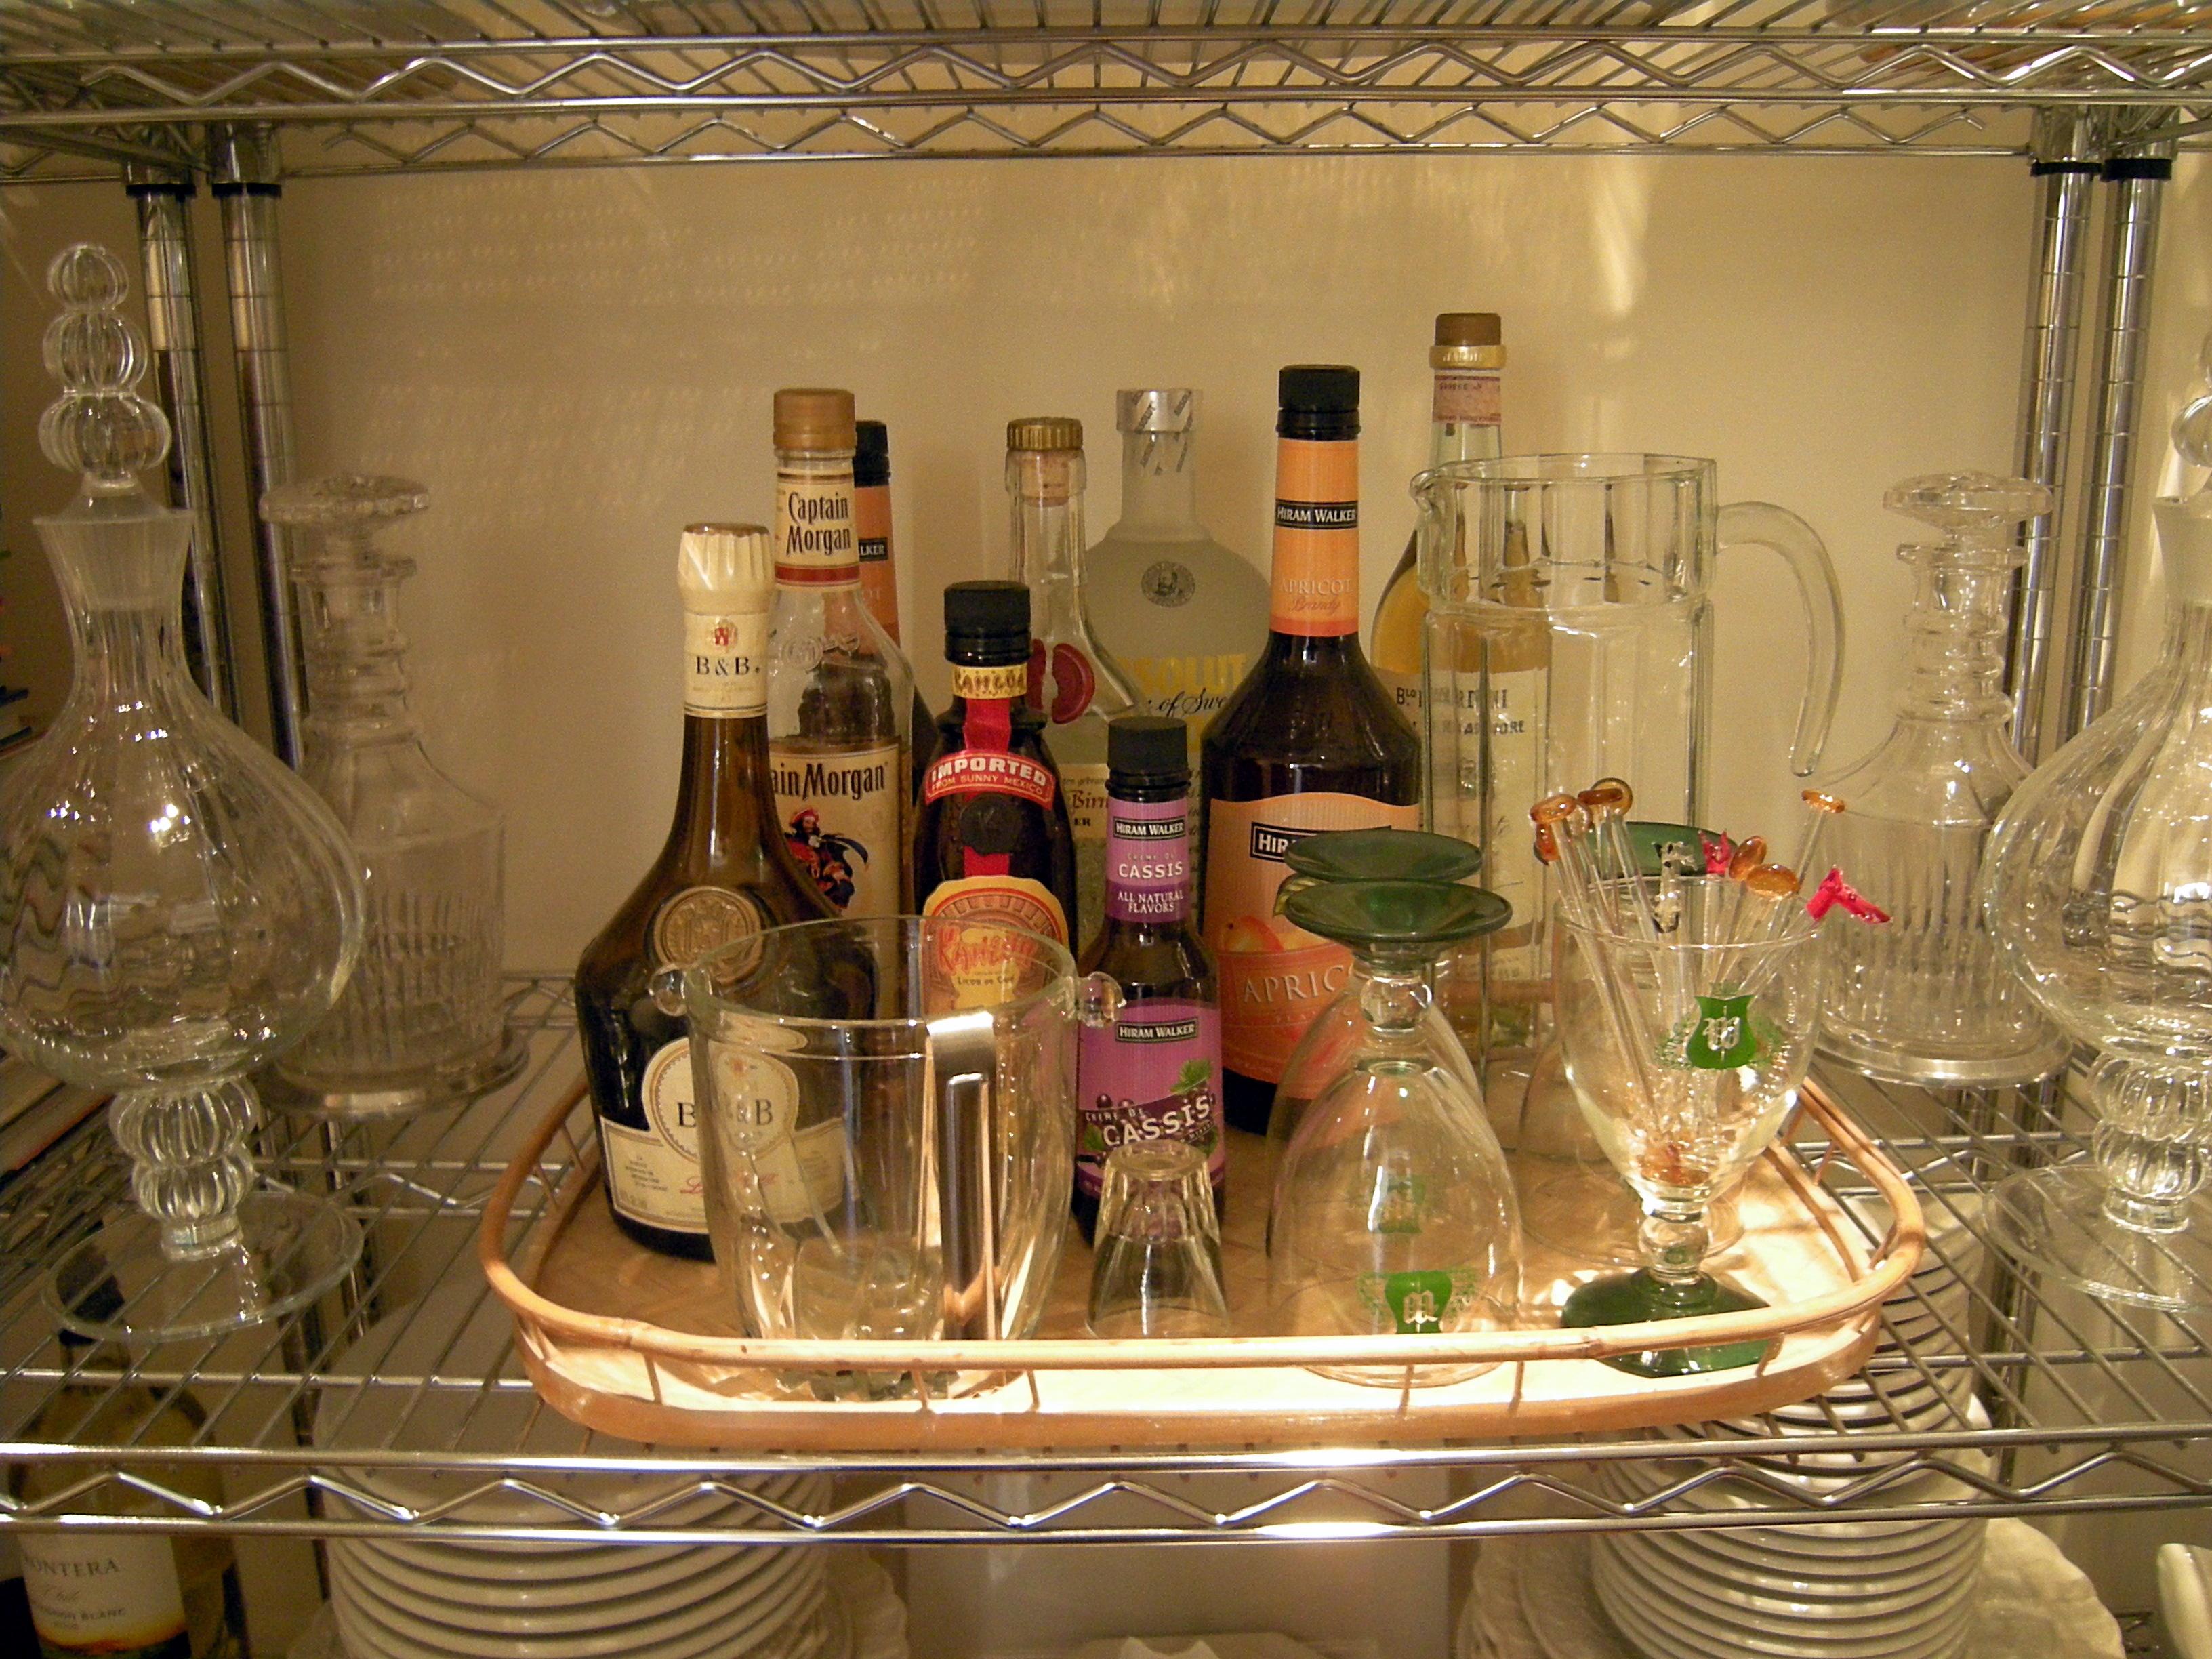 Ina Garten Pantry pantry | rustic chic